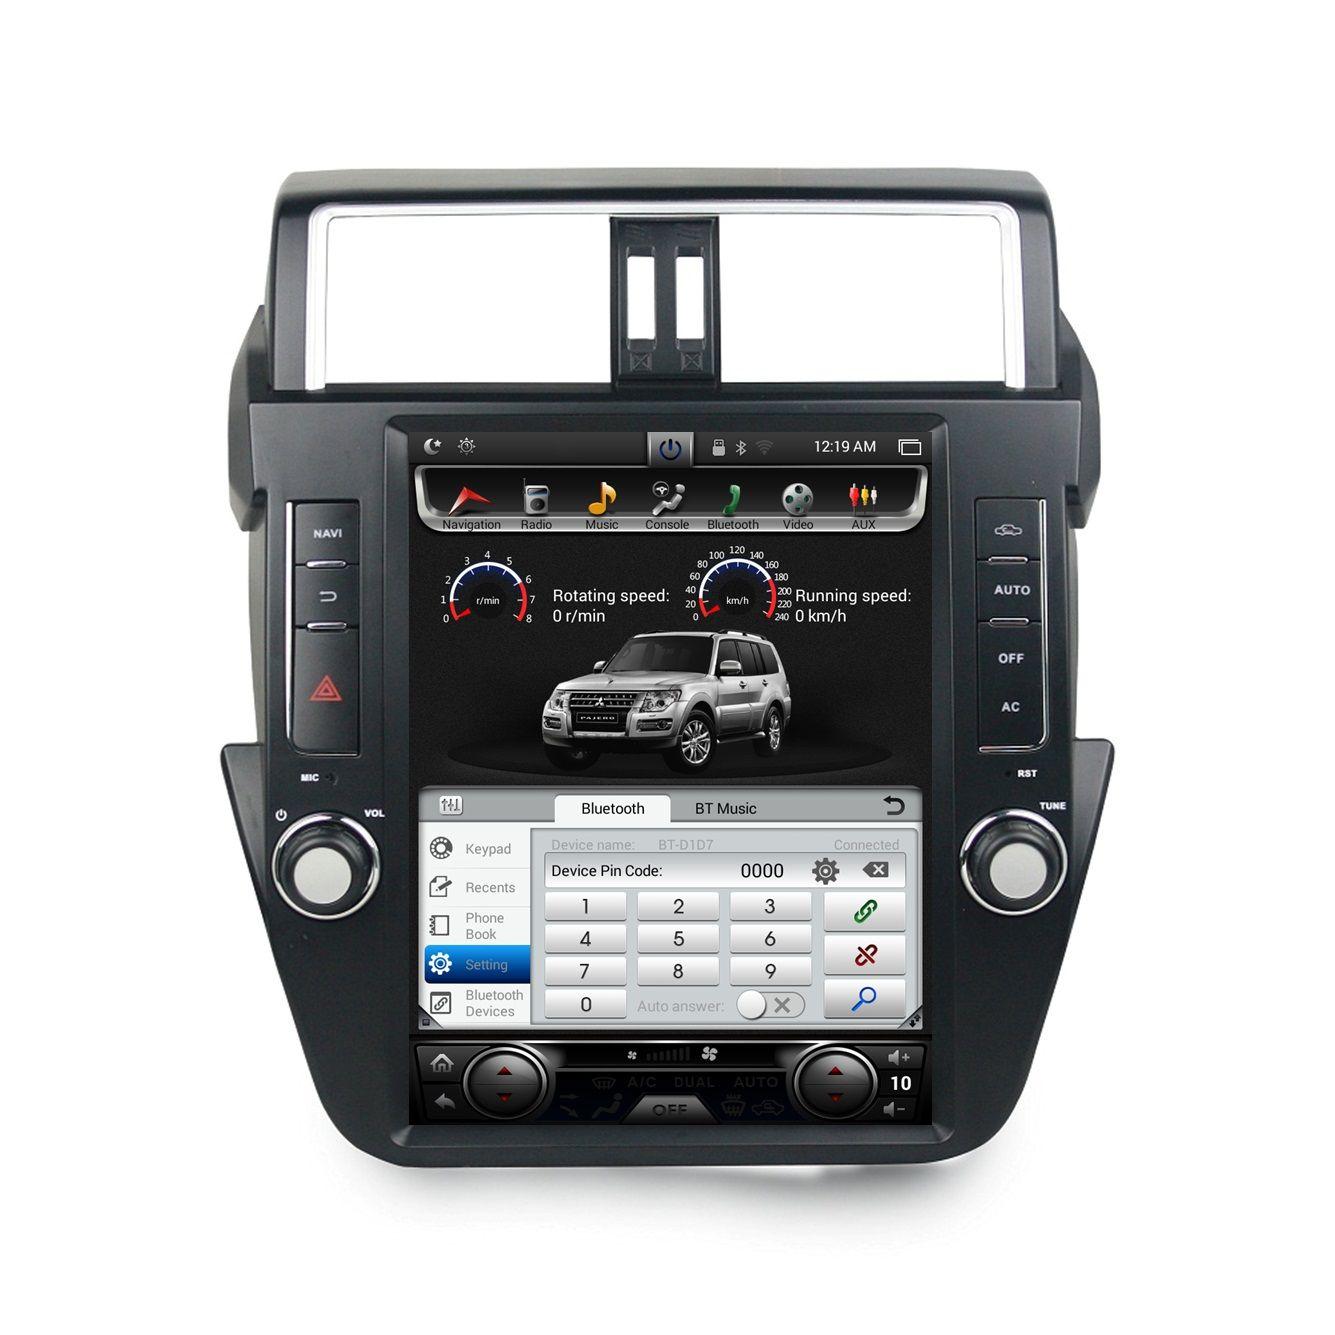 "2gb+32gb Android 7.1 Quad core 12.1"" Car DVD Player for Toyota Prado 150 LC150 2014-2017 Car Radio GPS Audio Bluetooth WIFI Mirror-link"